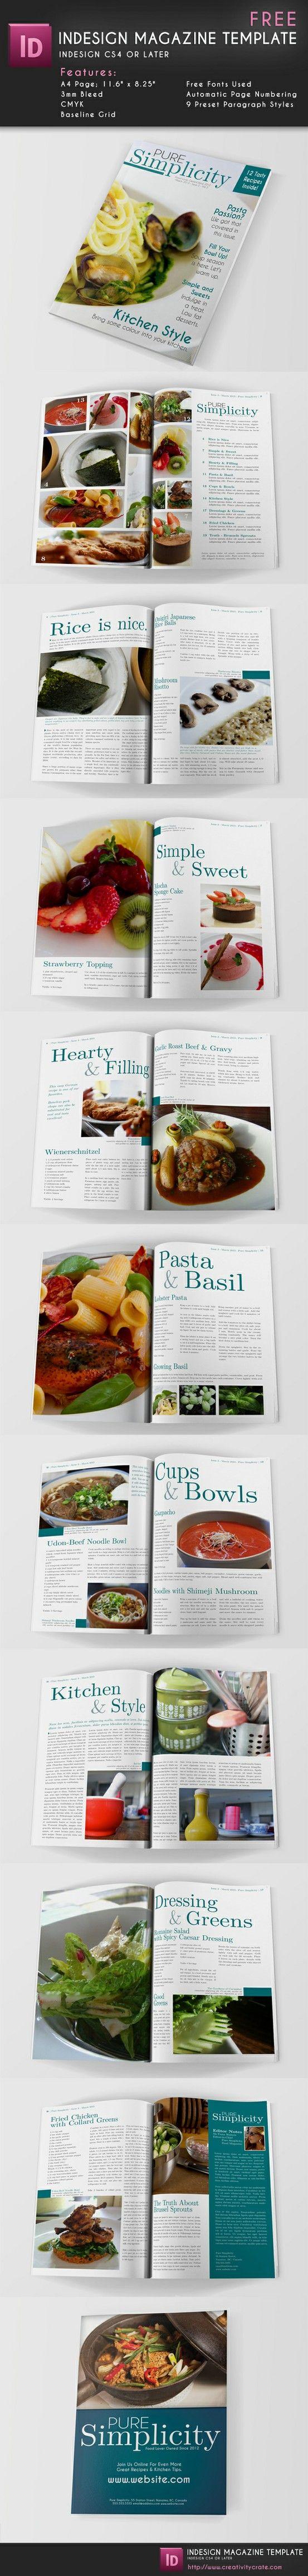 InDesign - Magazine Template Free, edit freely, CS4+